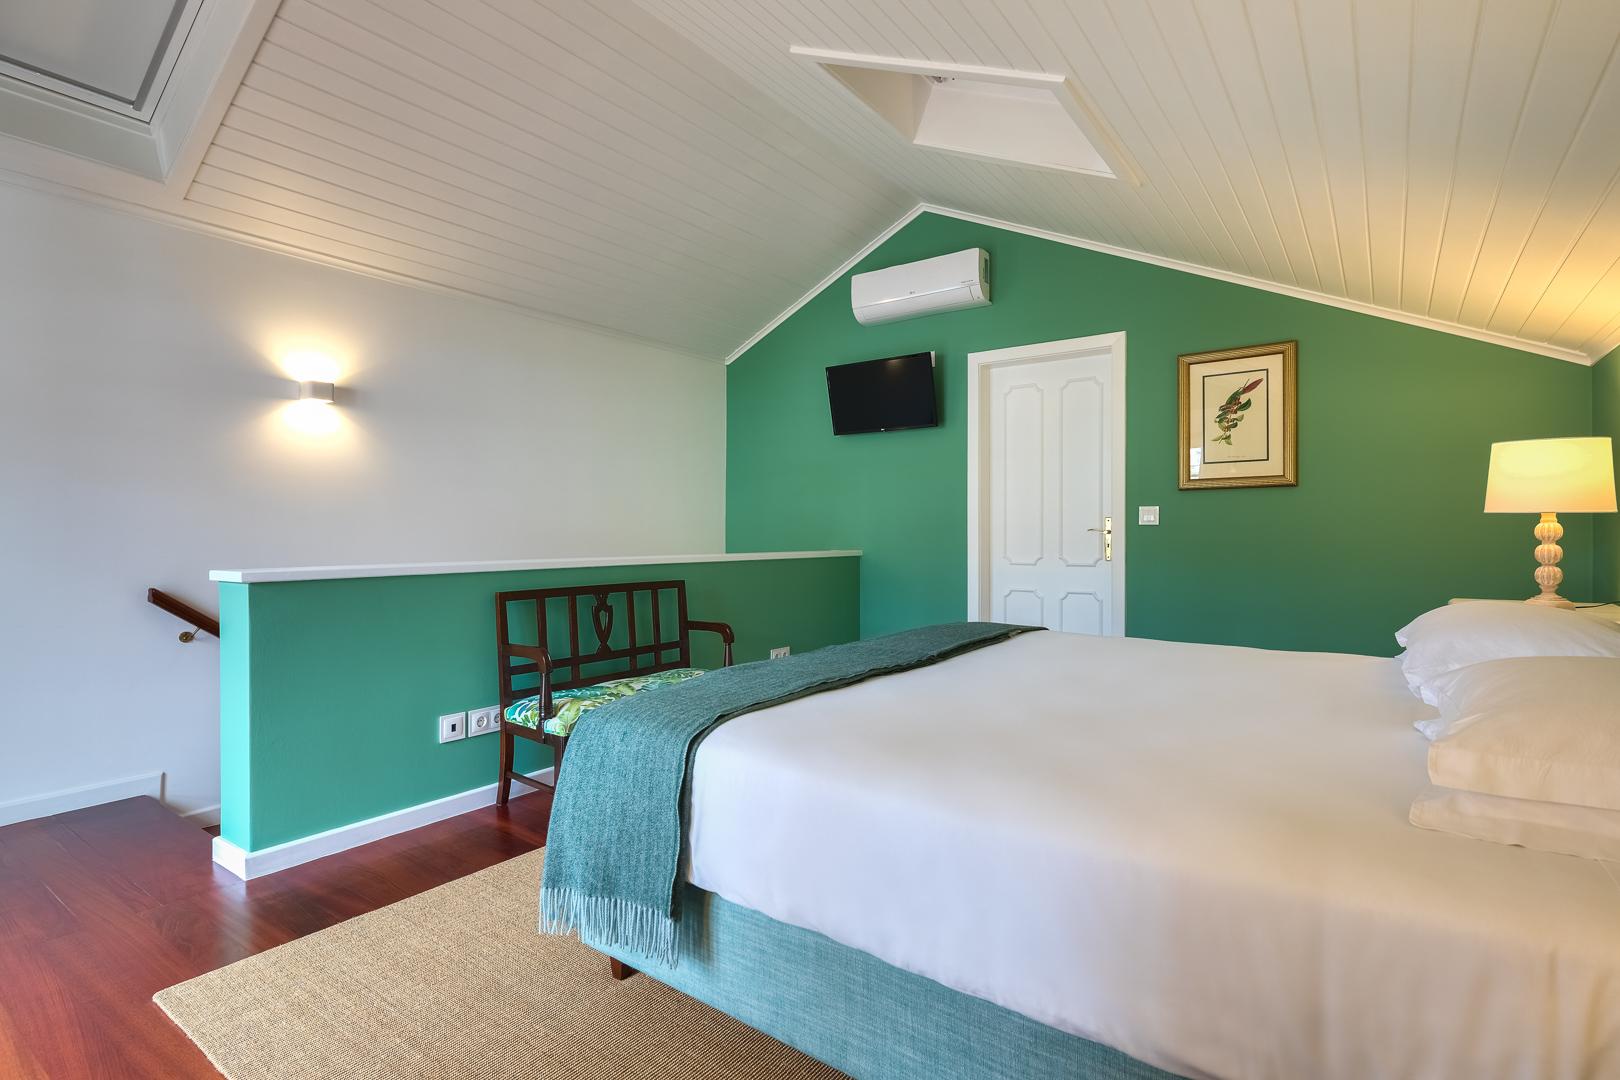 HOTEL_QUINTA_JARDINS_DO_LAGO_DIA_1_14022018_MG_6424_0406.jpg